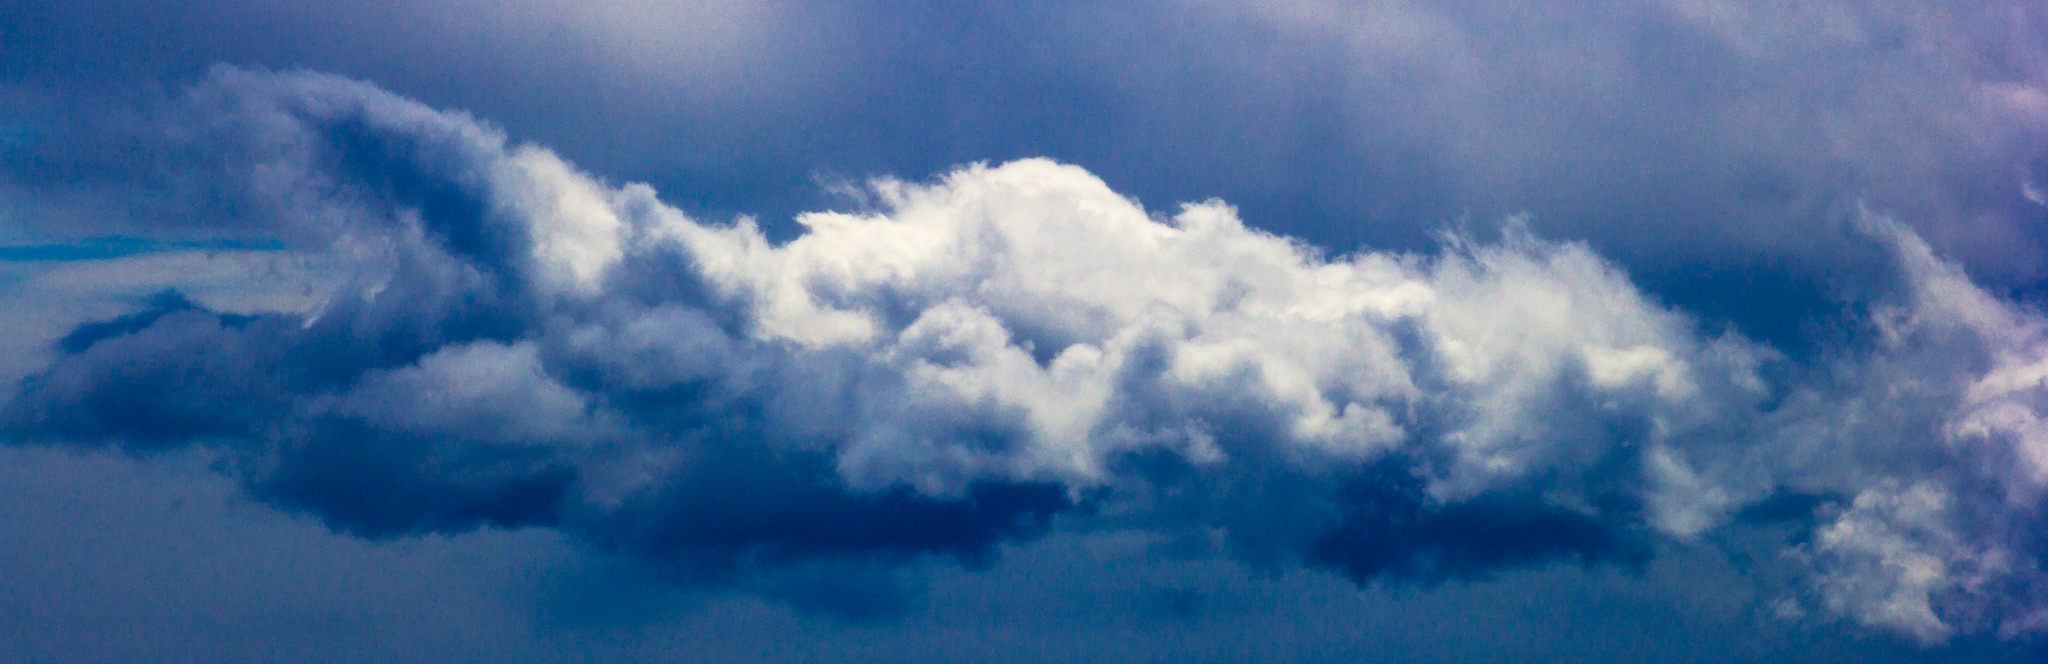 Blue-Cloud-Wall.jpg